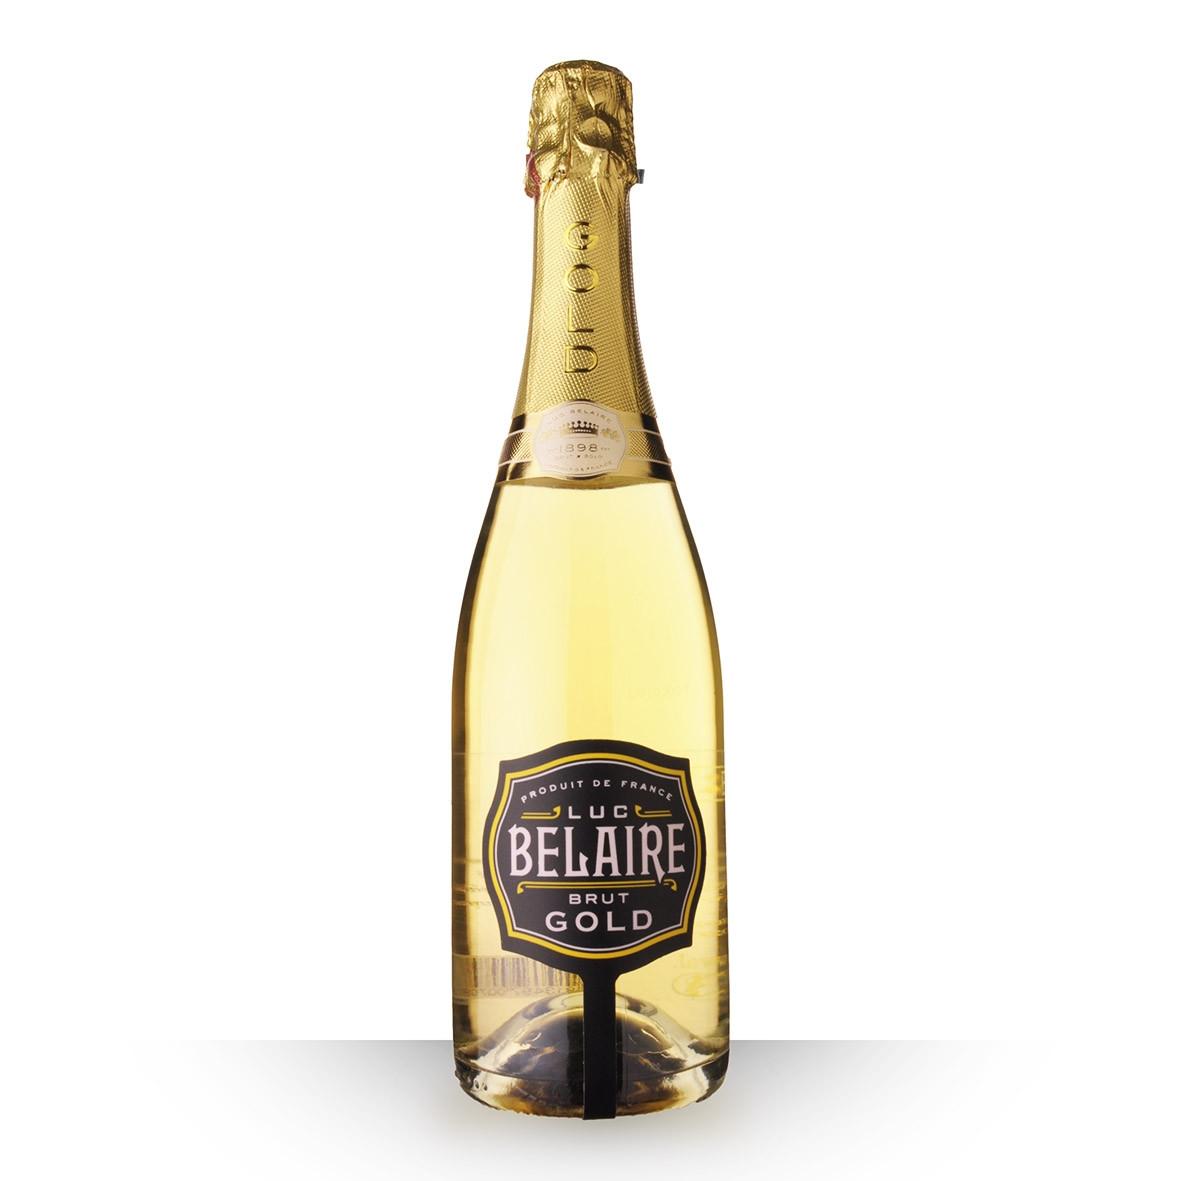 Luc Belaire Fantôme Gold Blanc 75cl www.odyssee-vins.com